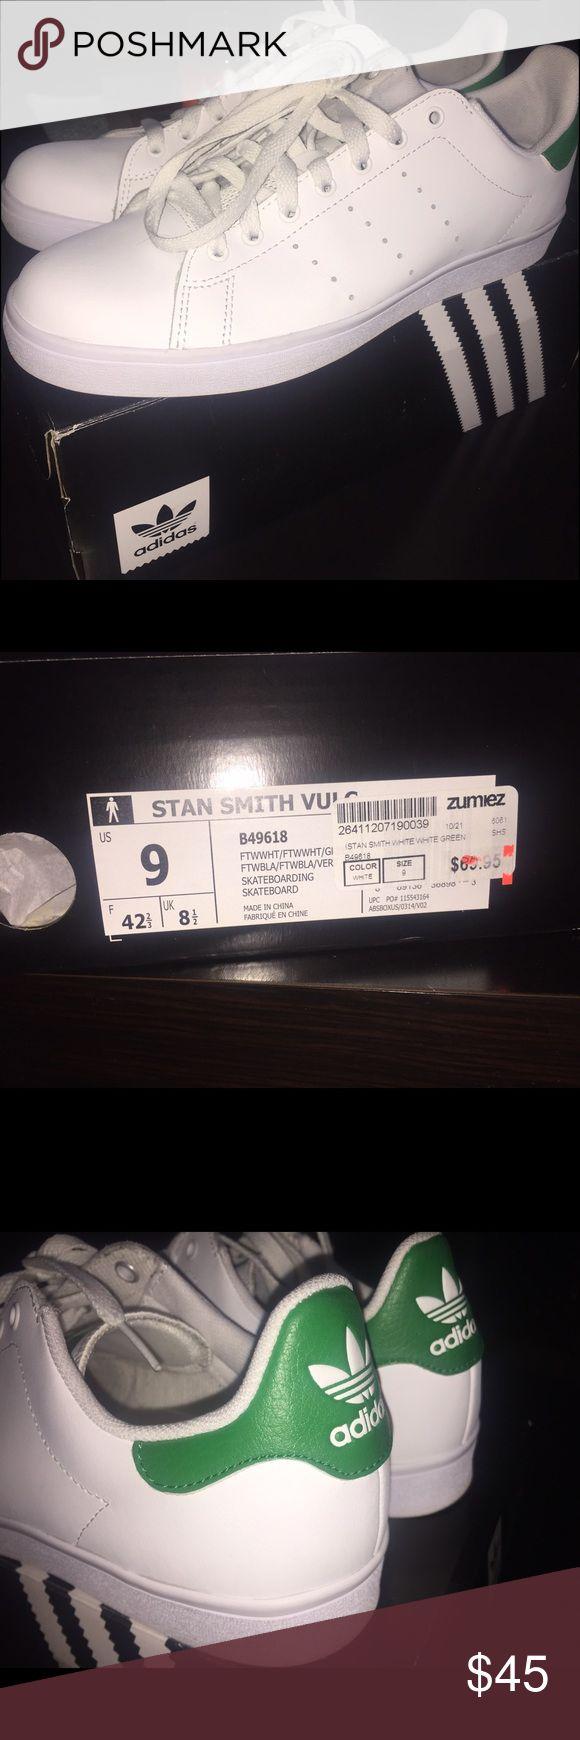 Zumiez roller skates - Adidas Stan Smiths Size 9 Adidas Skating Stan Smith Vulc They Are A